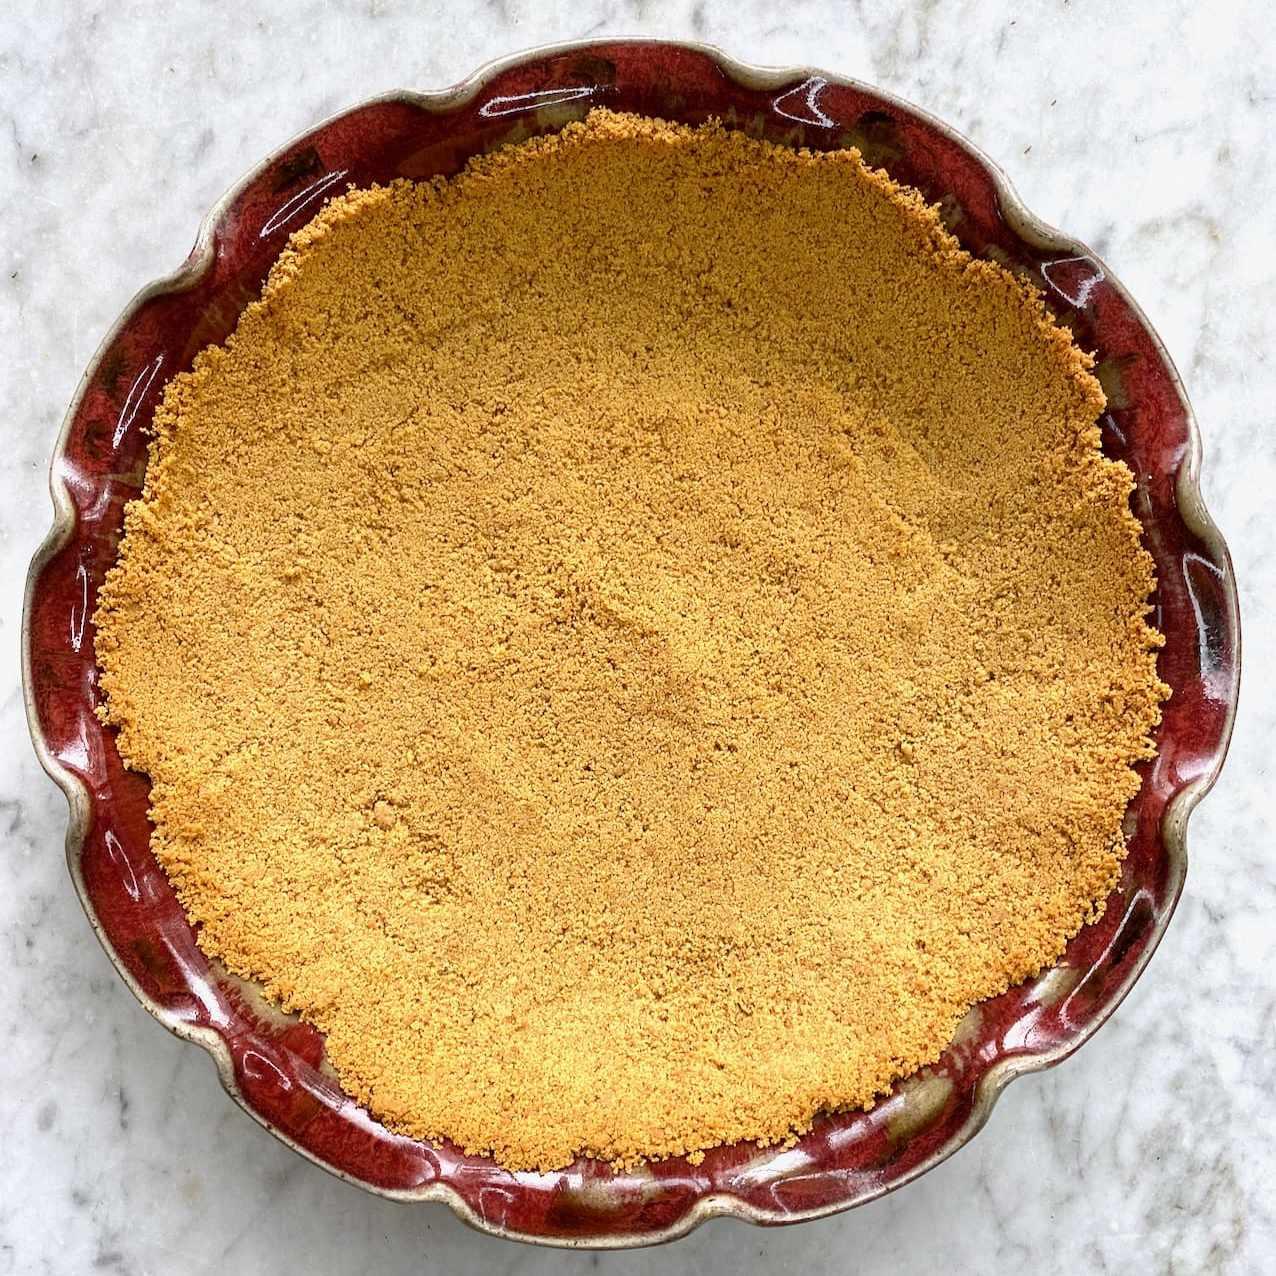 graham cracker crust for a pie